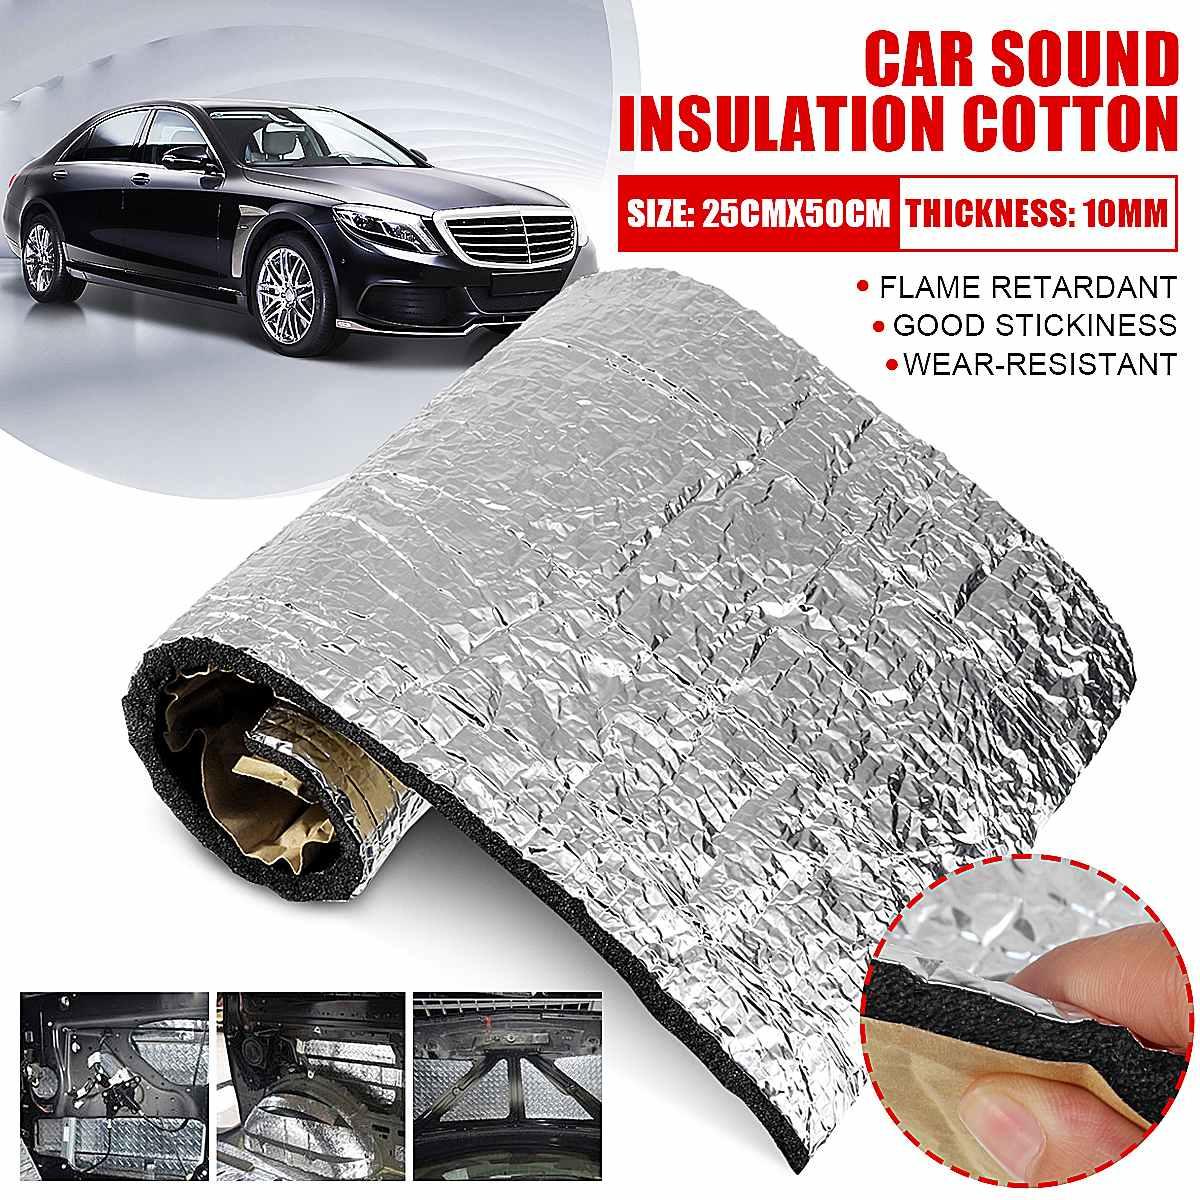 25x50cm 10mm Car Sound Deadener Insulation Cotton Mat Heat Noise Proofing Pad Anti-Noise Heat Inslution Mats